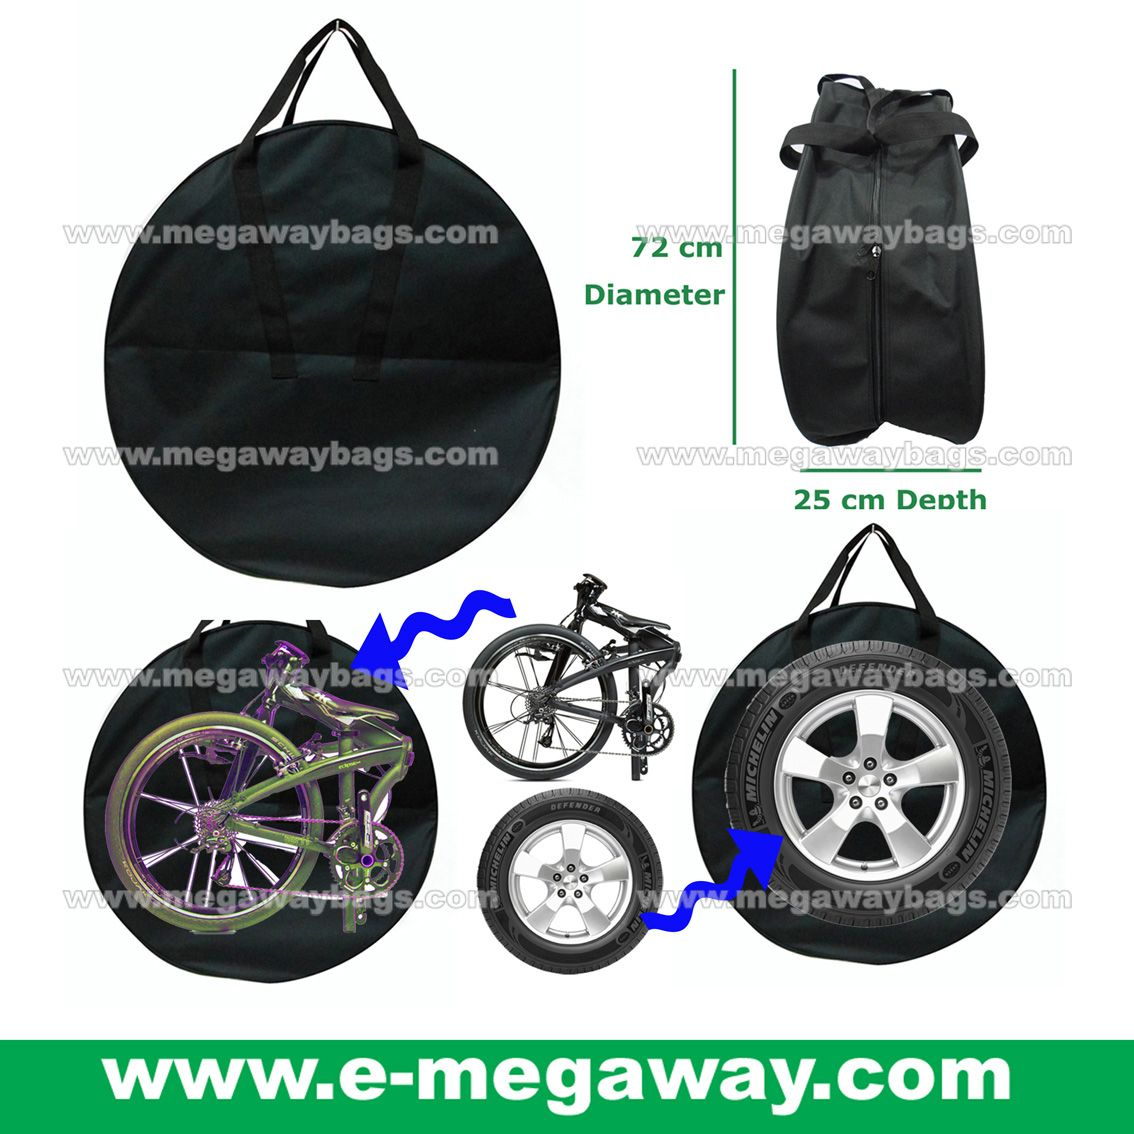 Big Durable Tough Bag Cycling Protective Cover Bags Bicycle Storage Tools Gear Bag Motor Motorcycle Bike Bmx Car Racing Gear Gear Bag Bags